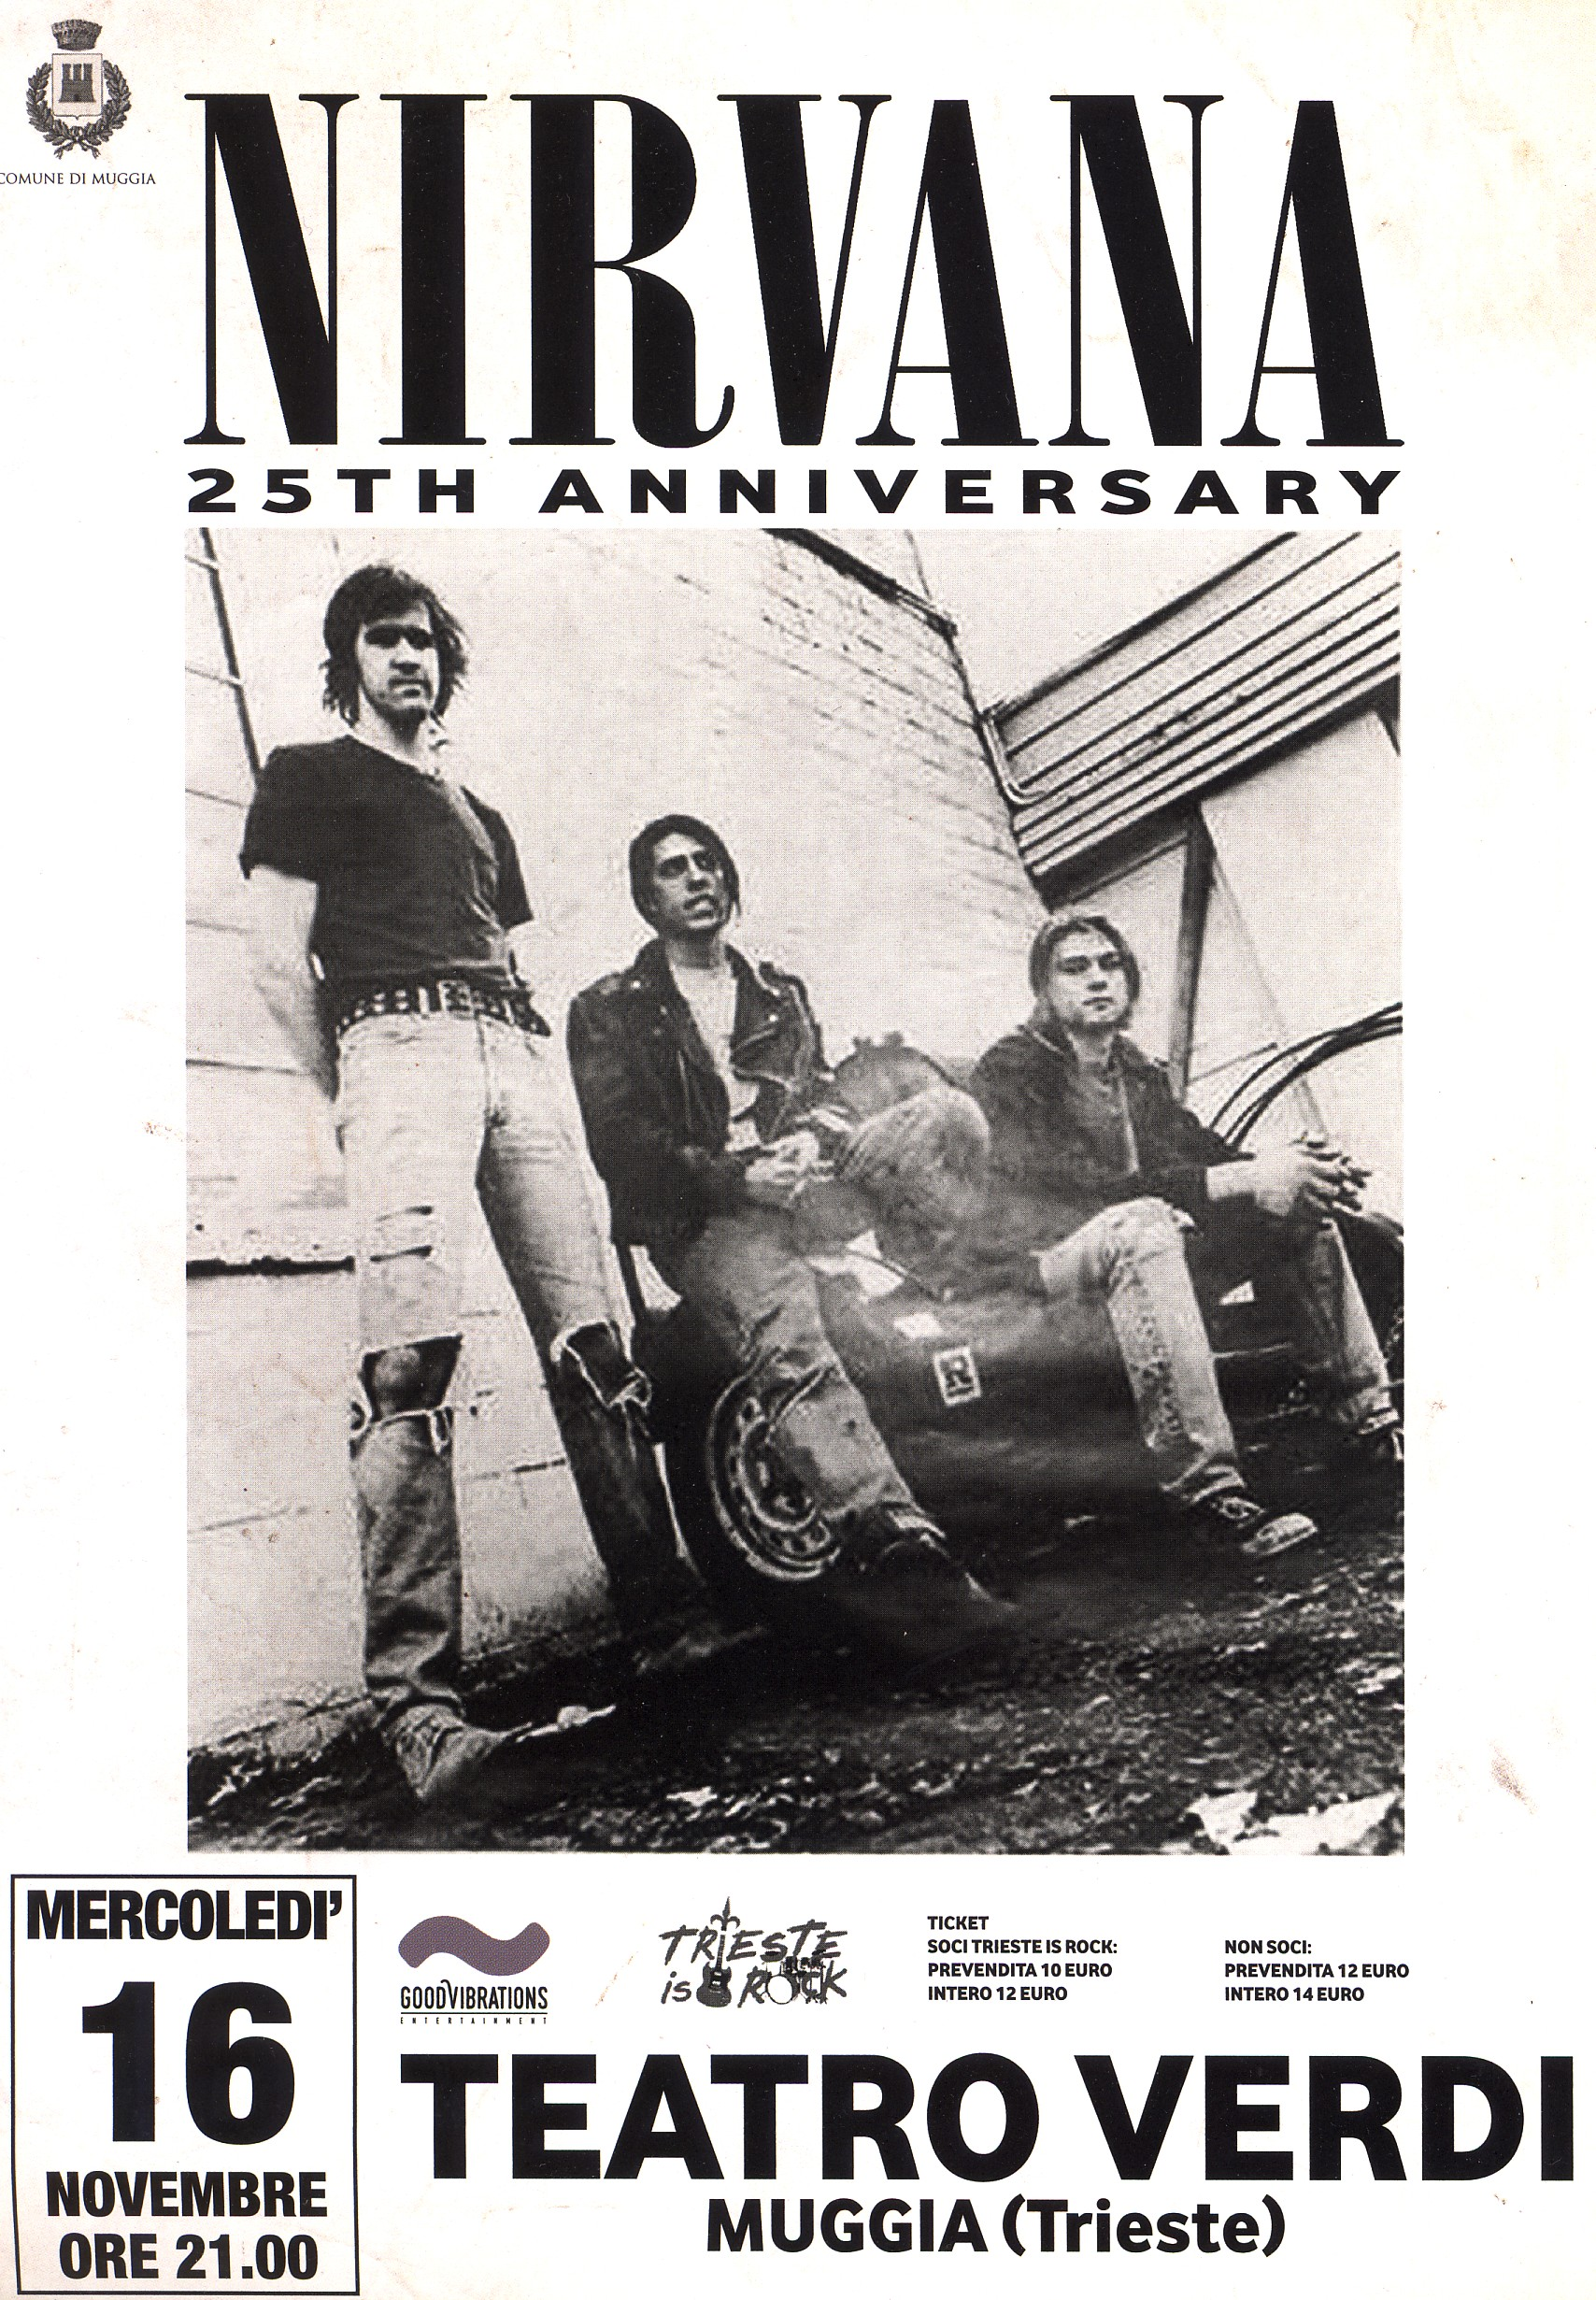 nirvana-25-anniversario